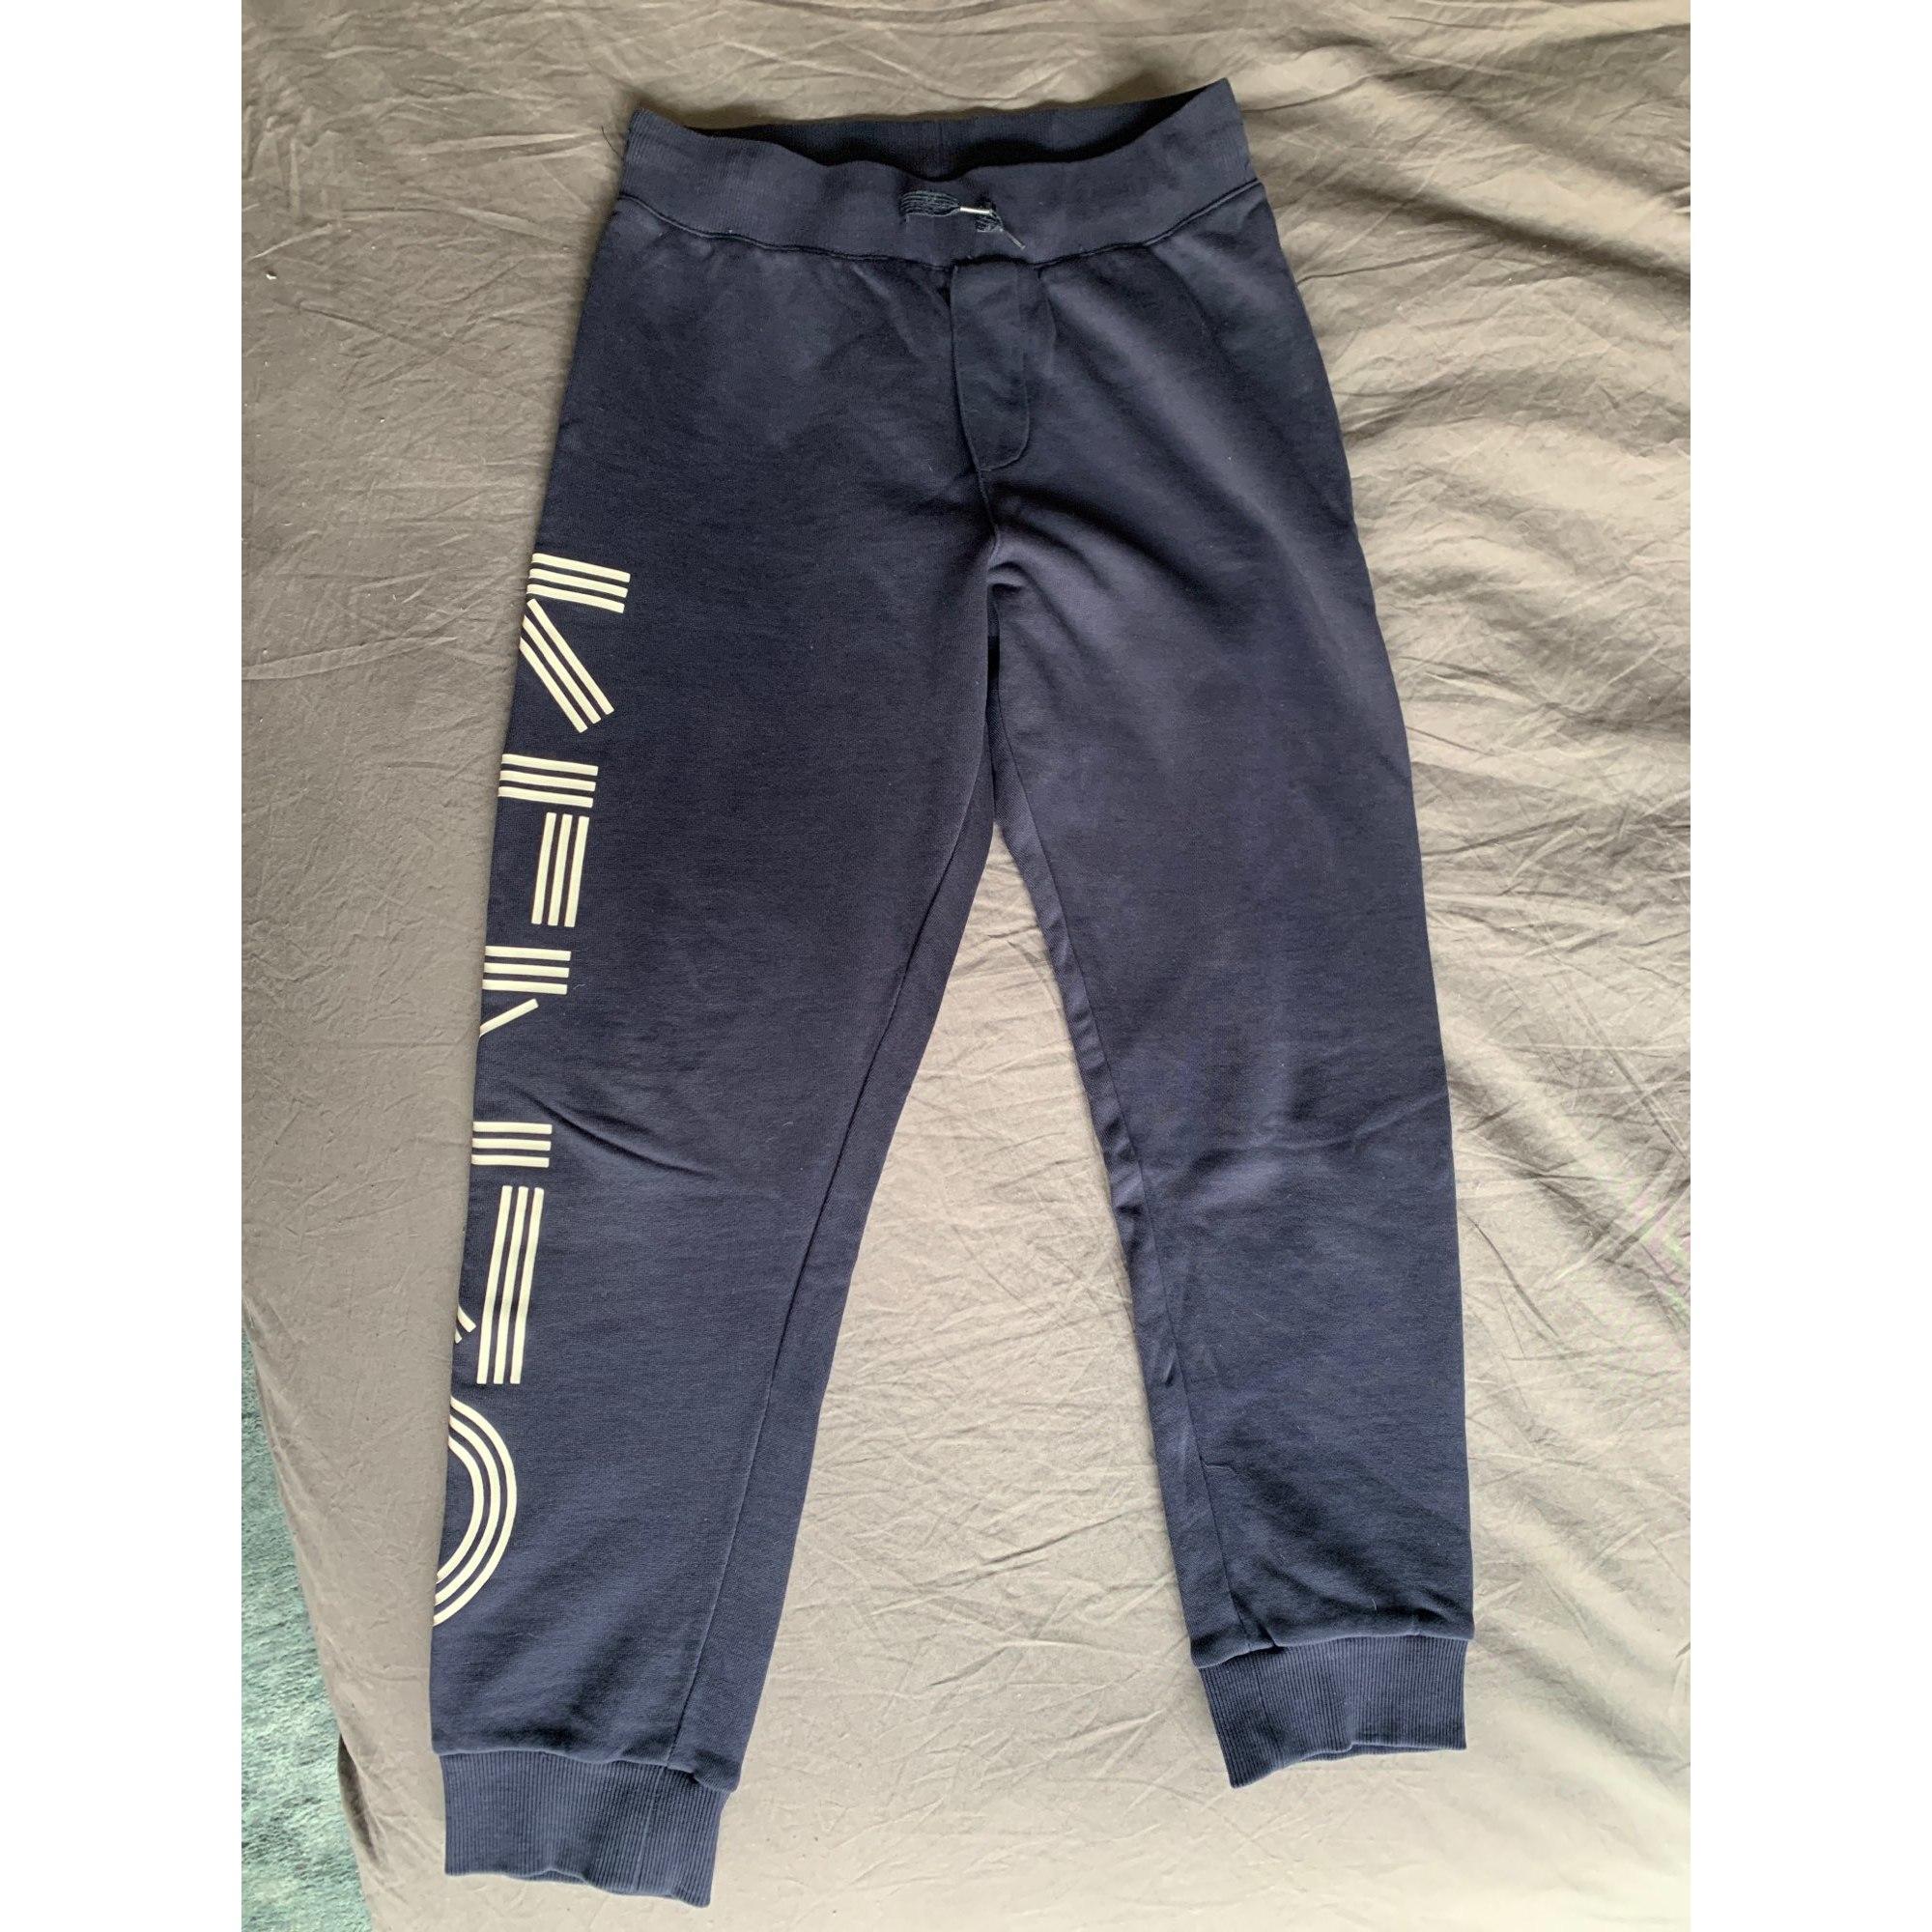 Pantalon de survêtement KENZO Bleu, bleu marine, bleu turquoise